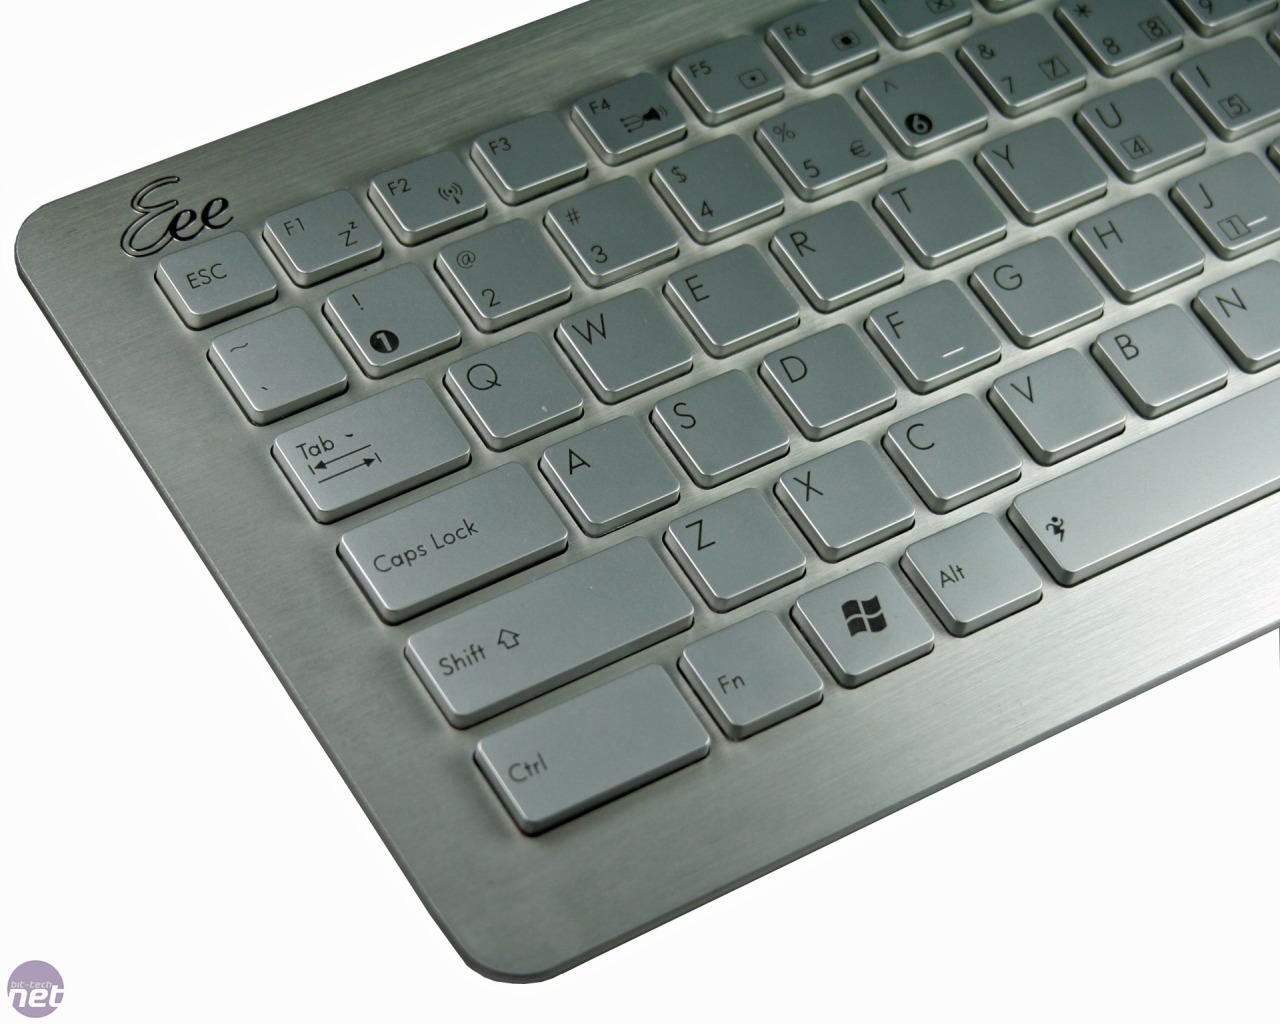 ASUS Eee Keyboard PC Review Bit technet